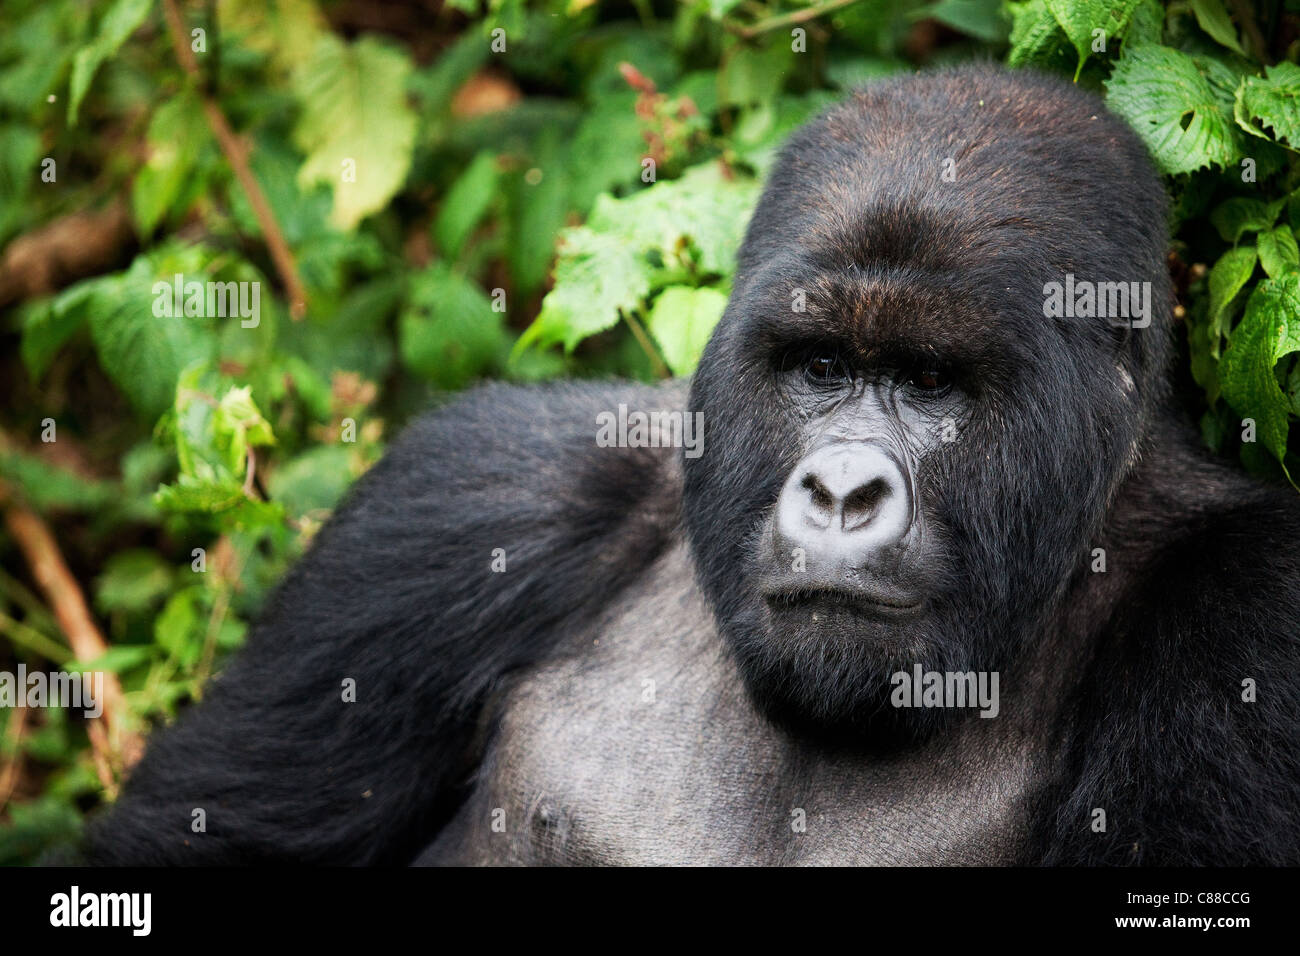 Rwanda Gorilla Silverback - Stock Image